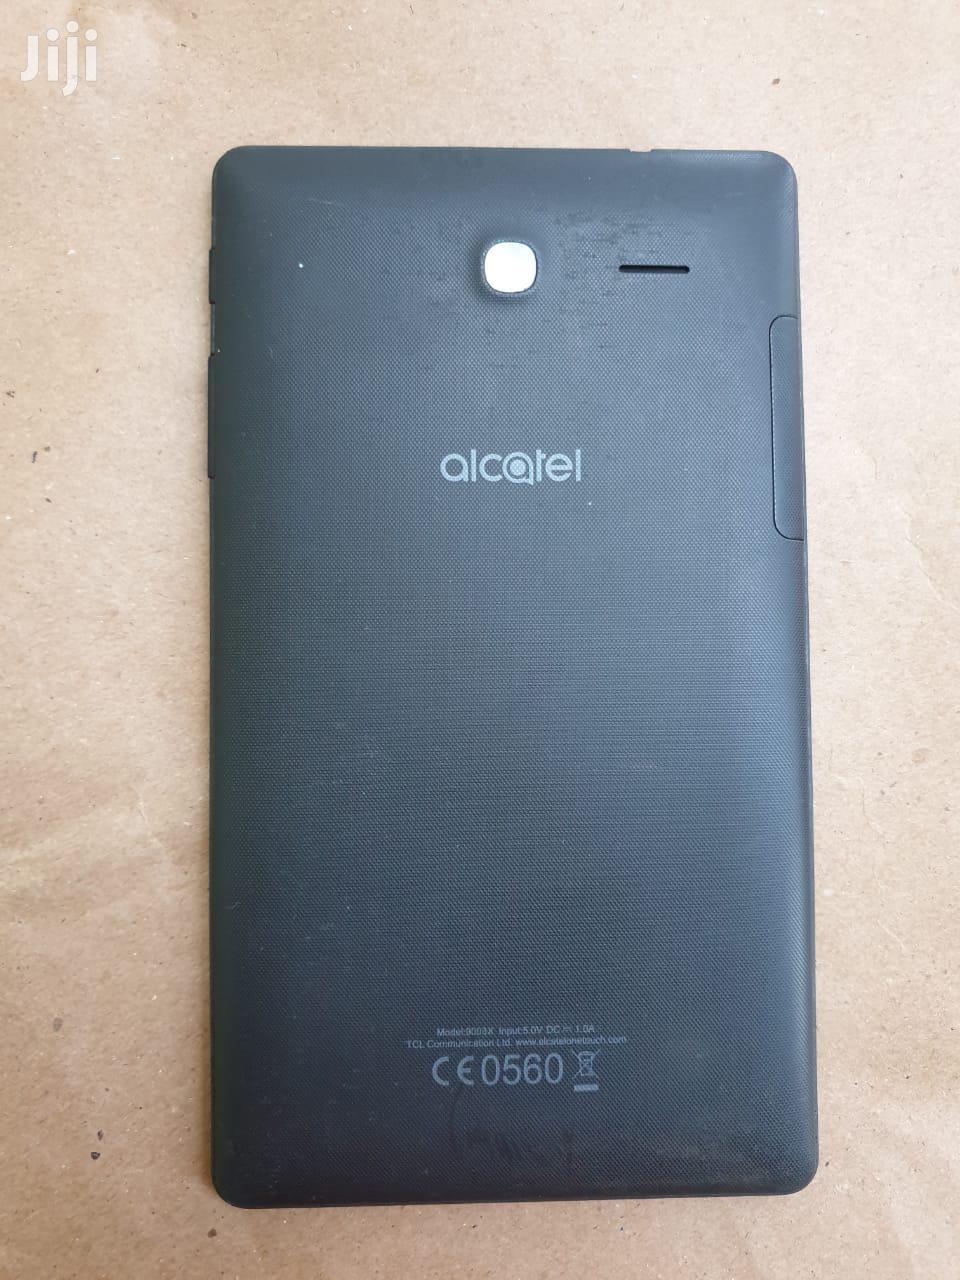 Archive: Alcatel Pixi 4 (7) 16 GB Black